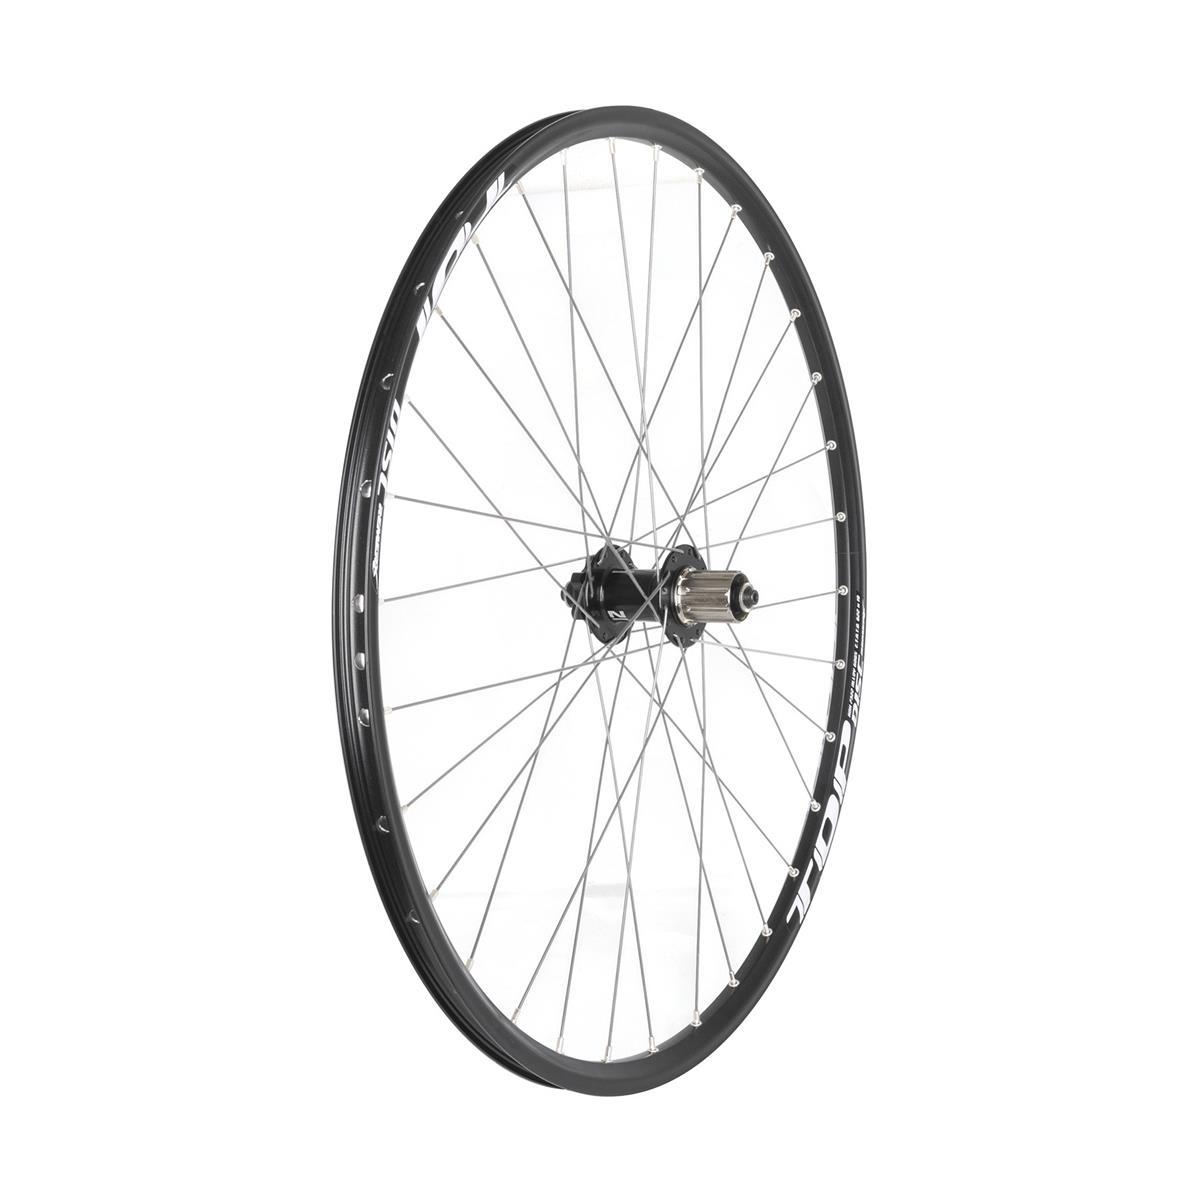 Trekking Rear Wheel 2.19 28'' 11s 32H Disc Brake Quick Release Black